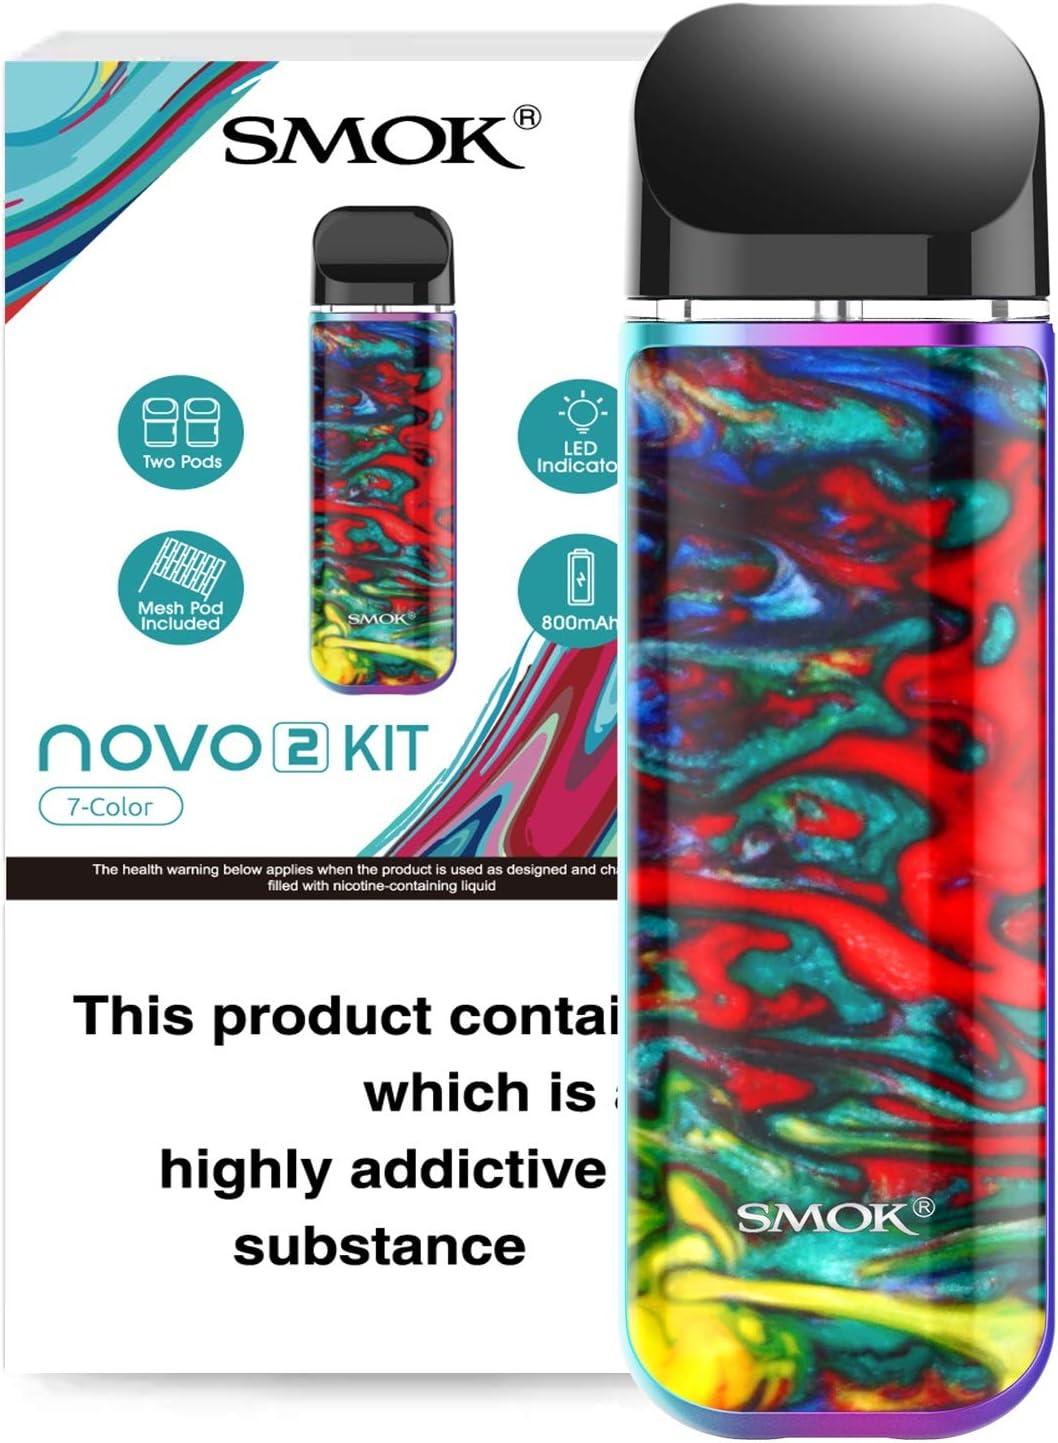 SMOK NOVO 2 Kit Vape POD sistemas 2ml (Raya de resina de 7 colores)